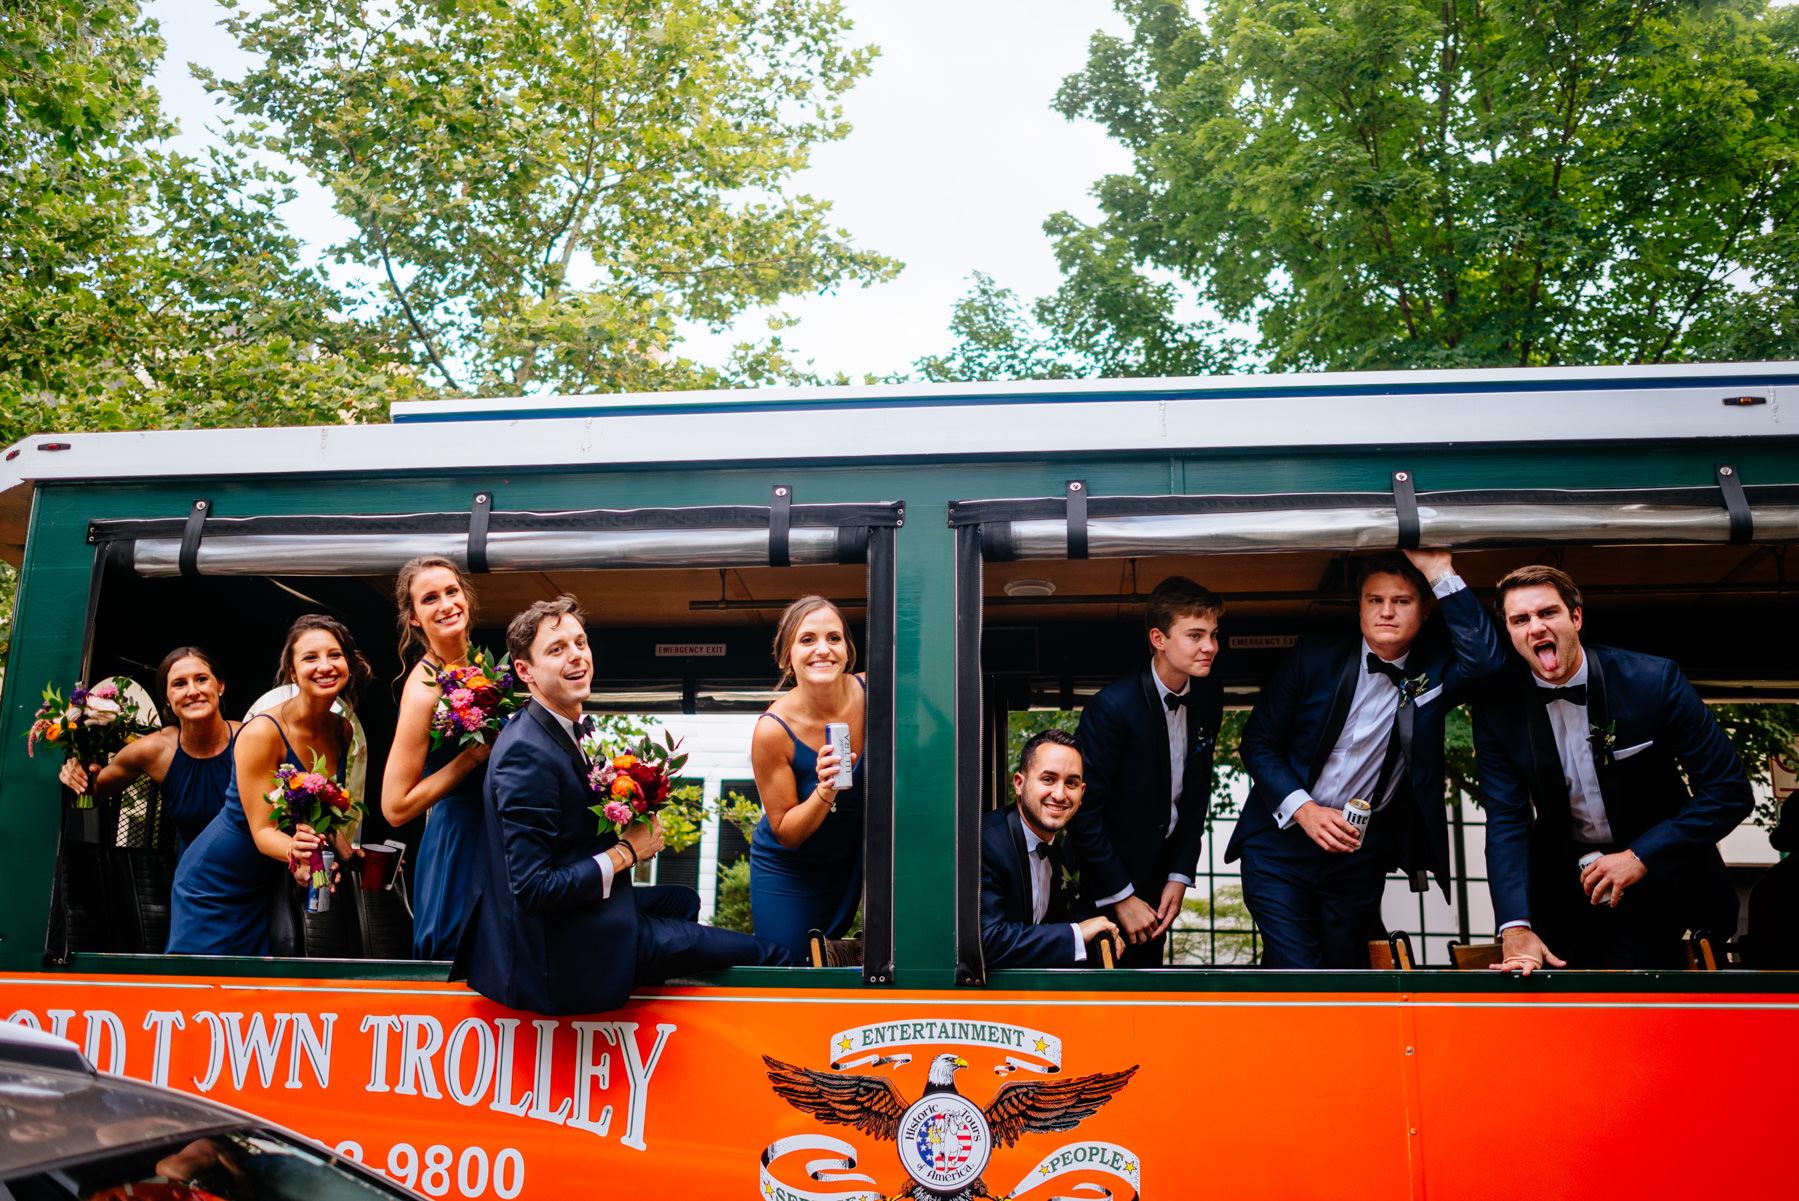 wedding party on trolley